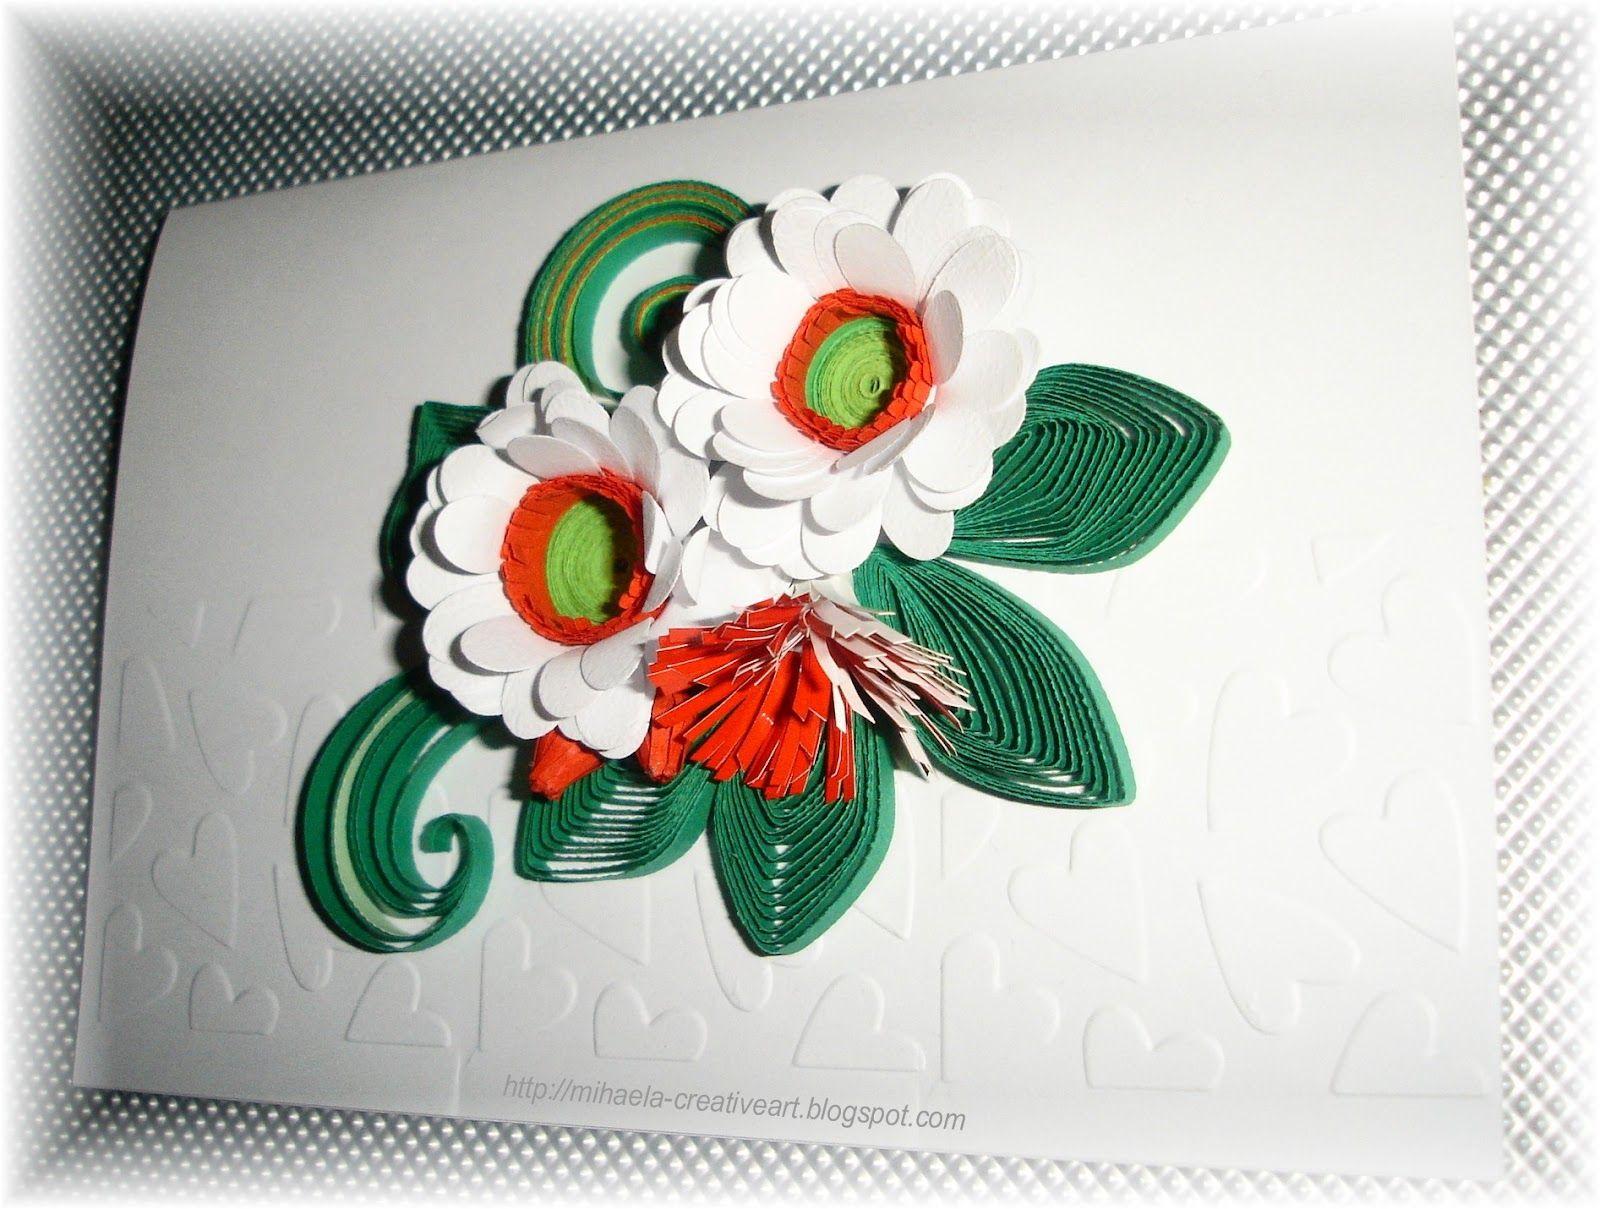 Handmade by Mihaela: Snowdrops